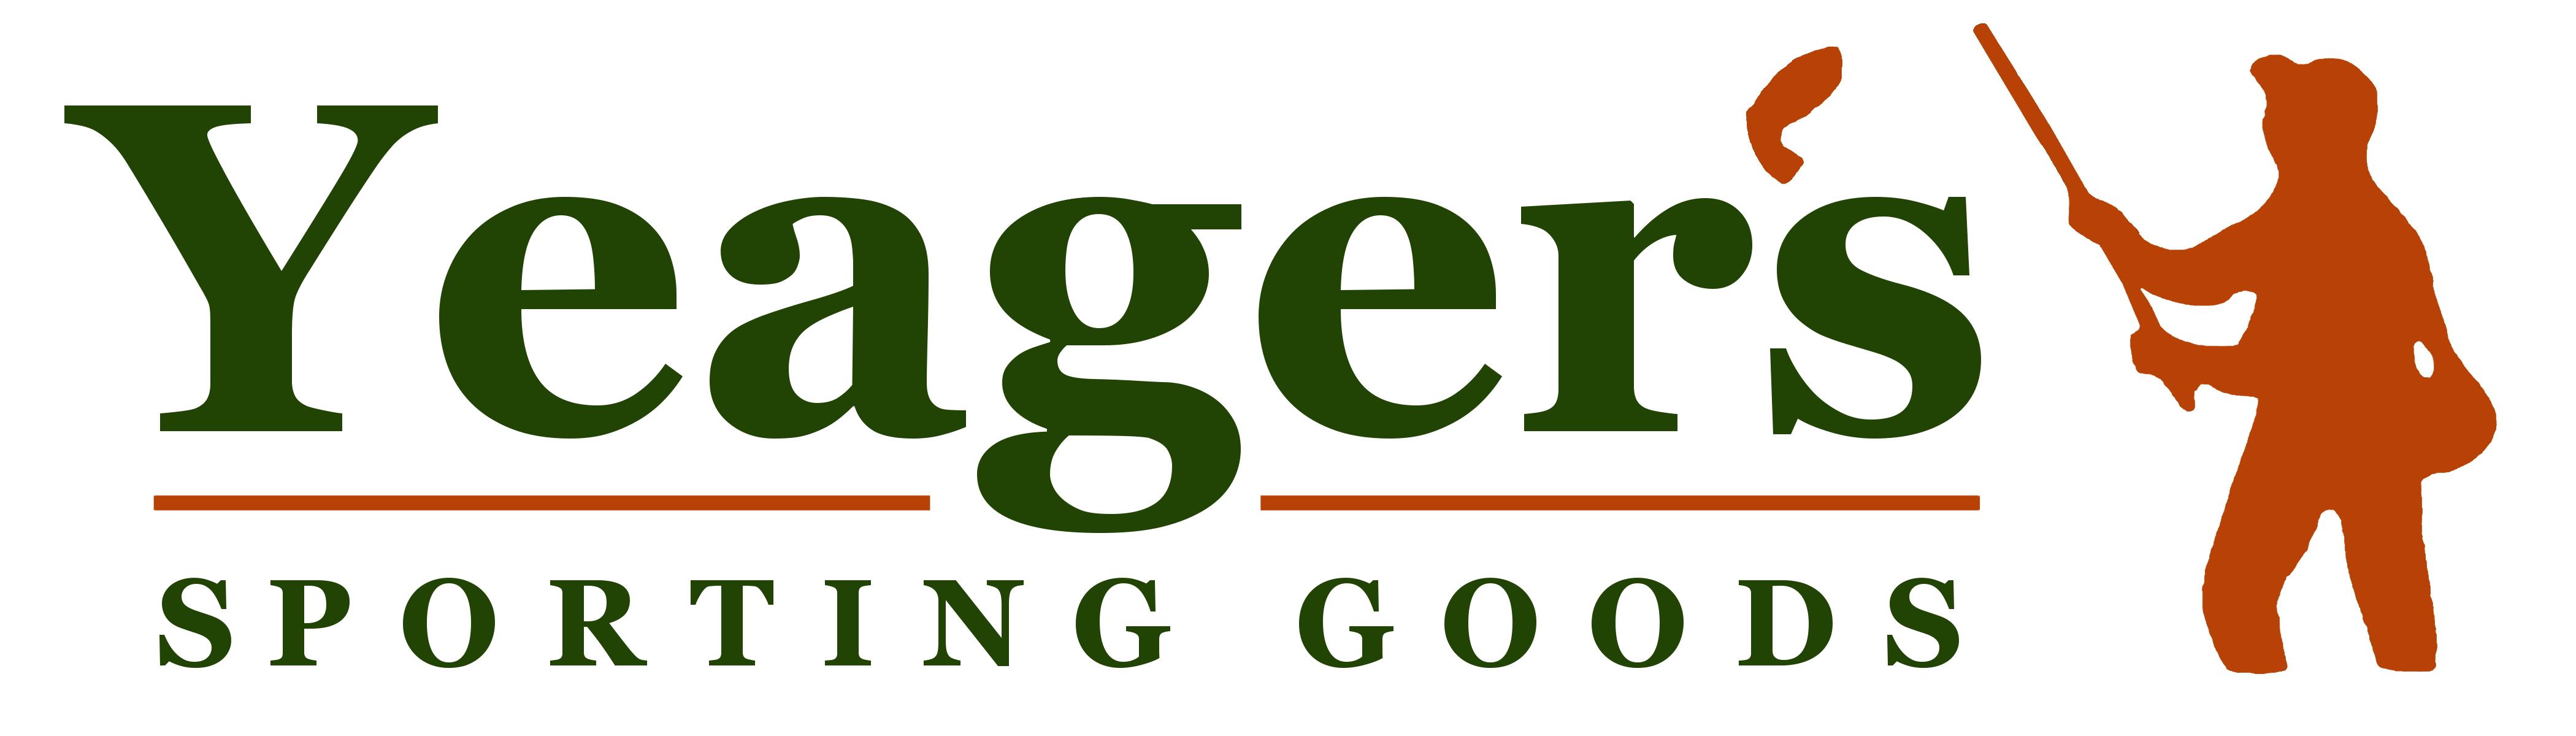 Sponsor logo - Yeager's